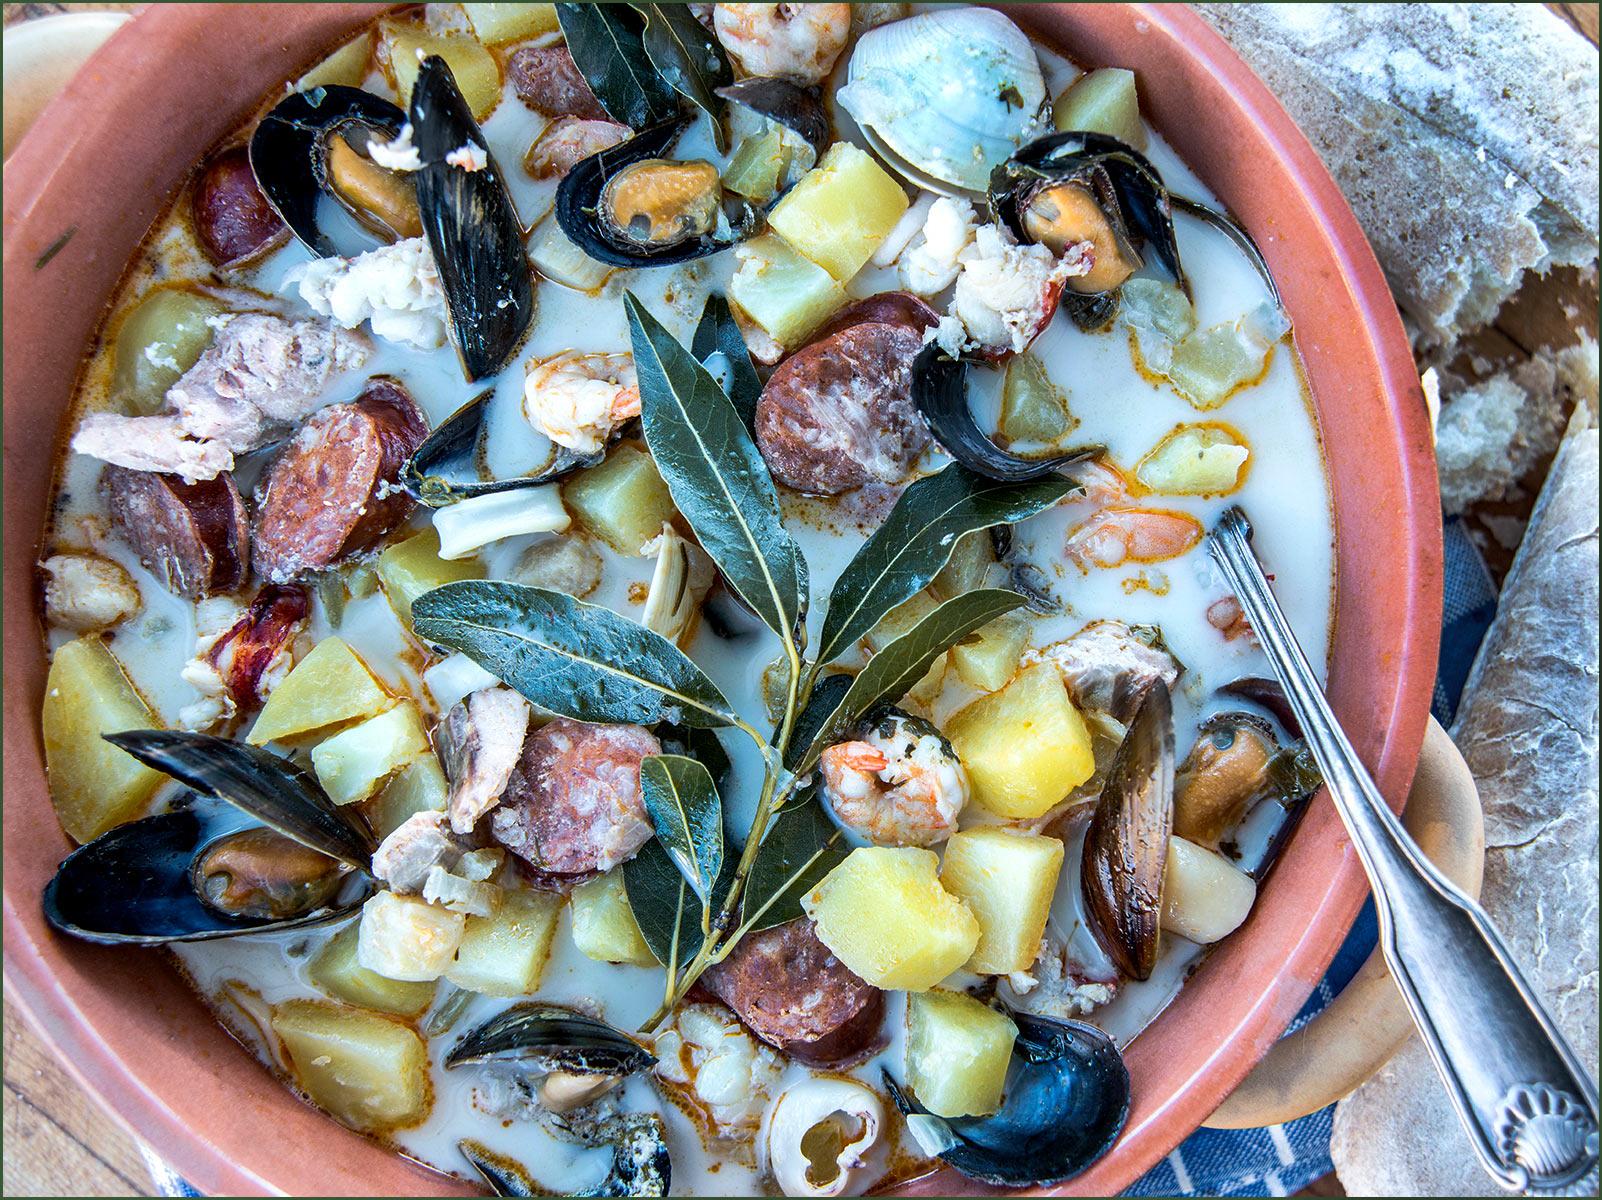 Fish-Stew-Carl-Kravats-Photography